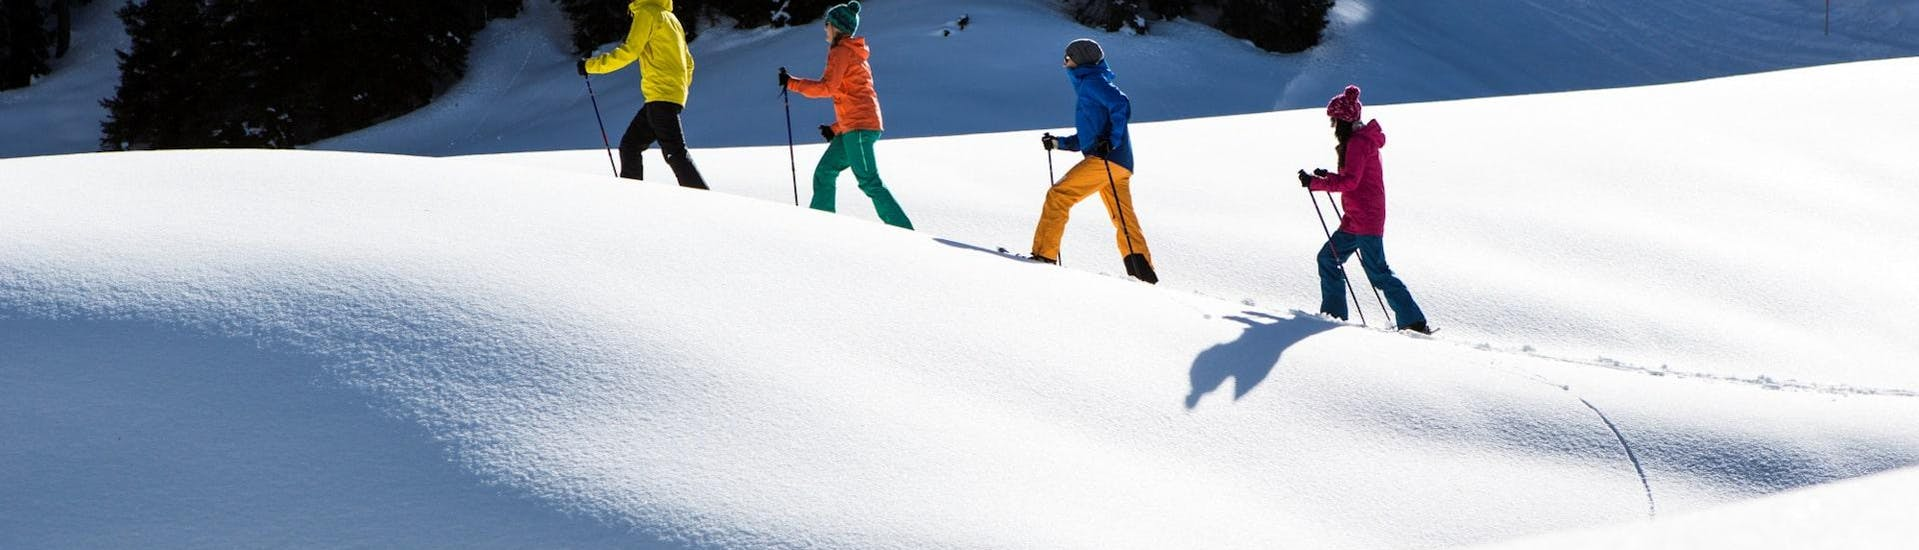 Snowshoeing Private - Silvretta Montafon - All Levels with Skischule Gaschurn-Partenen - Hero image